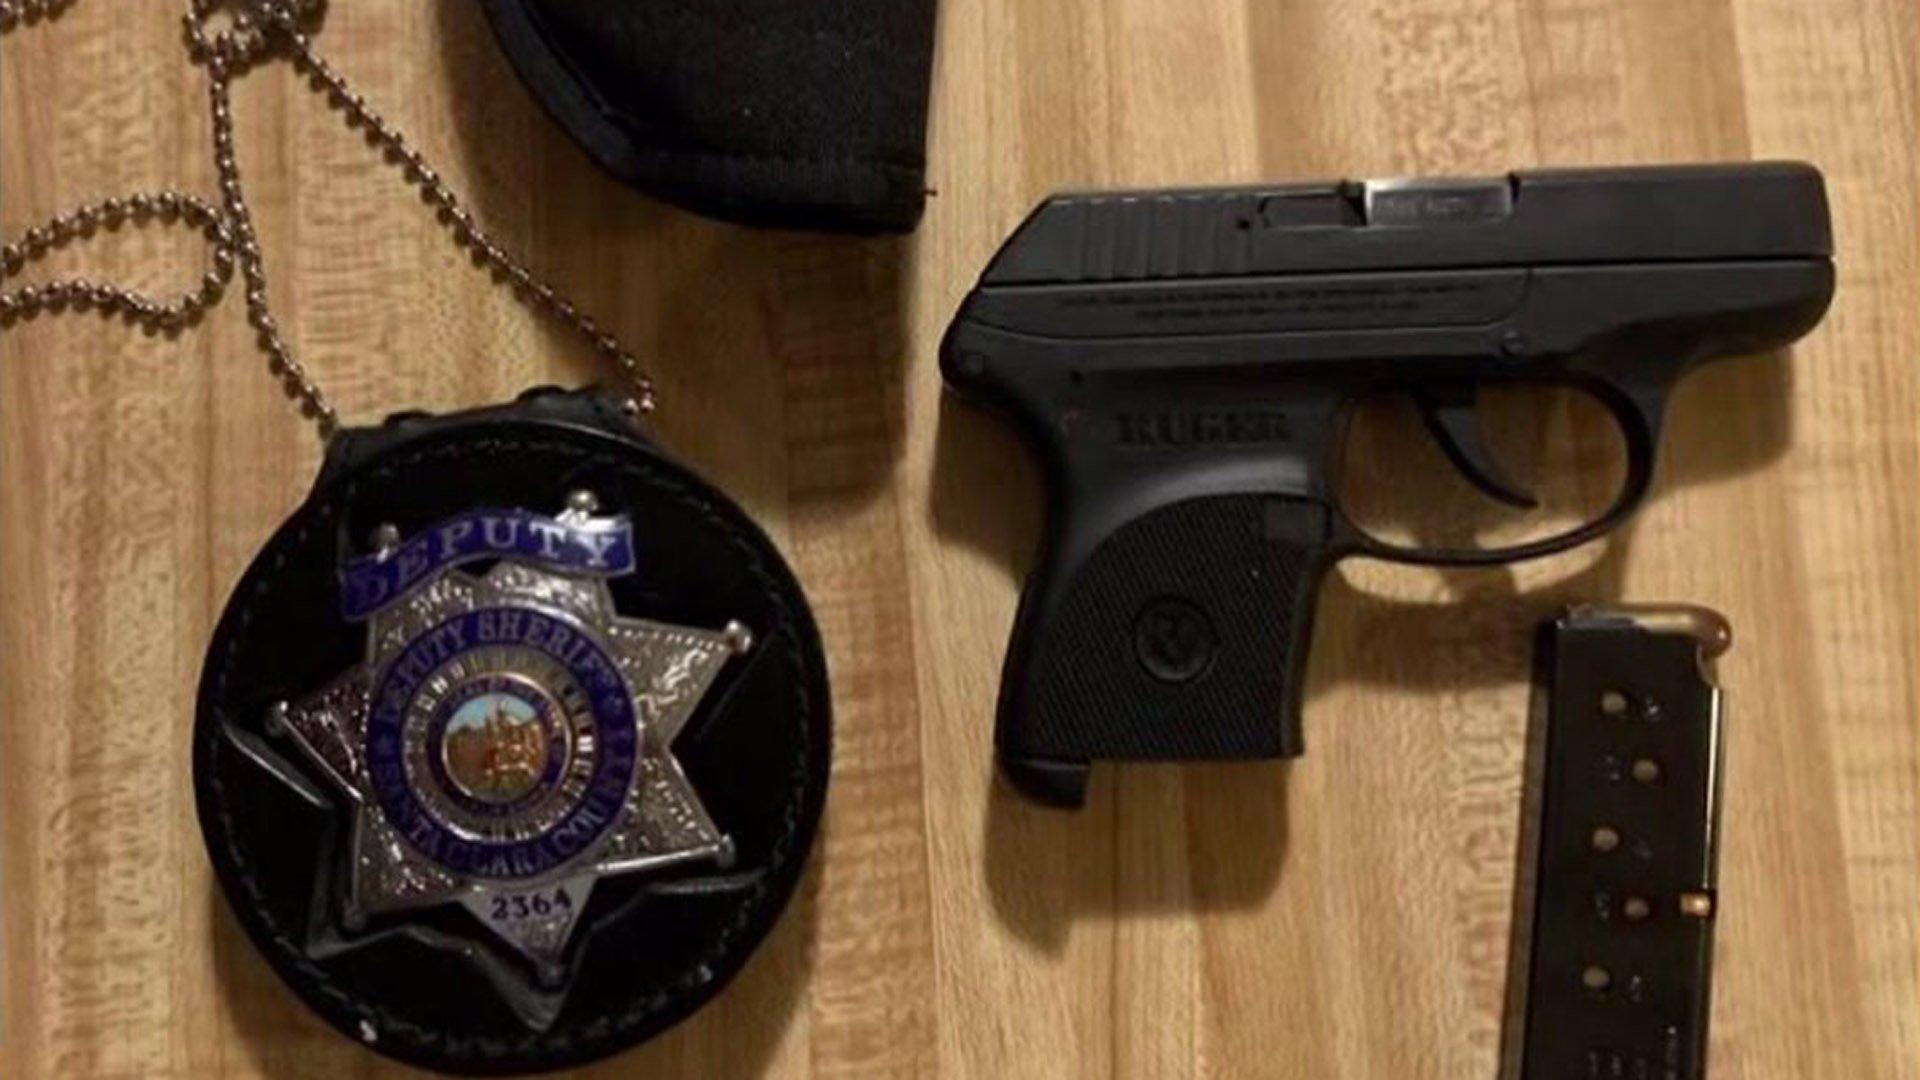 A gun and badge found at a South Lake Tahoe rental. (Credit: KTXL)